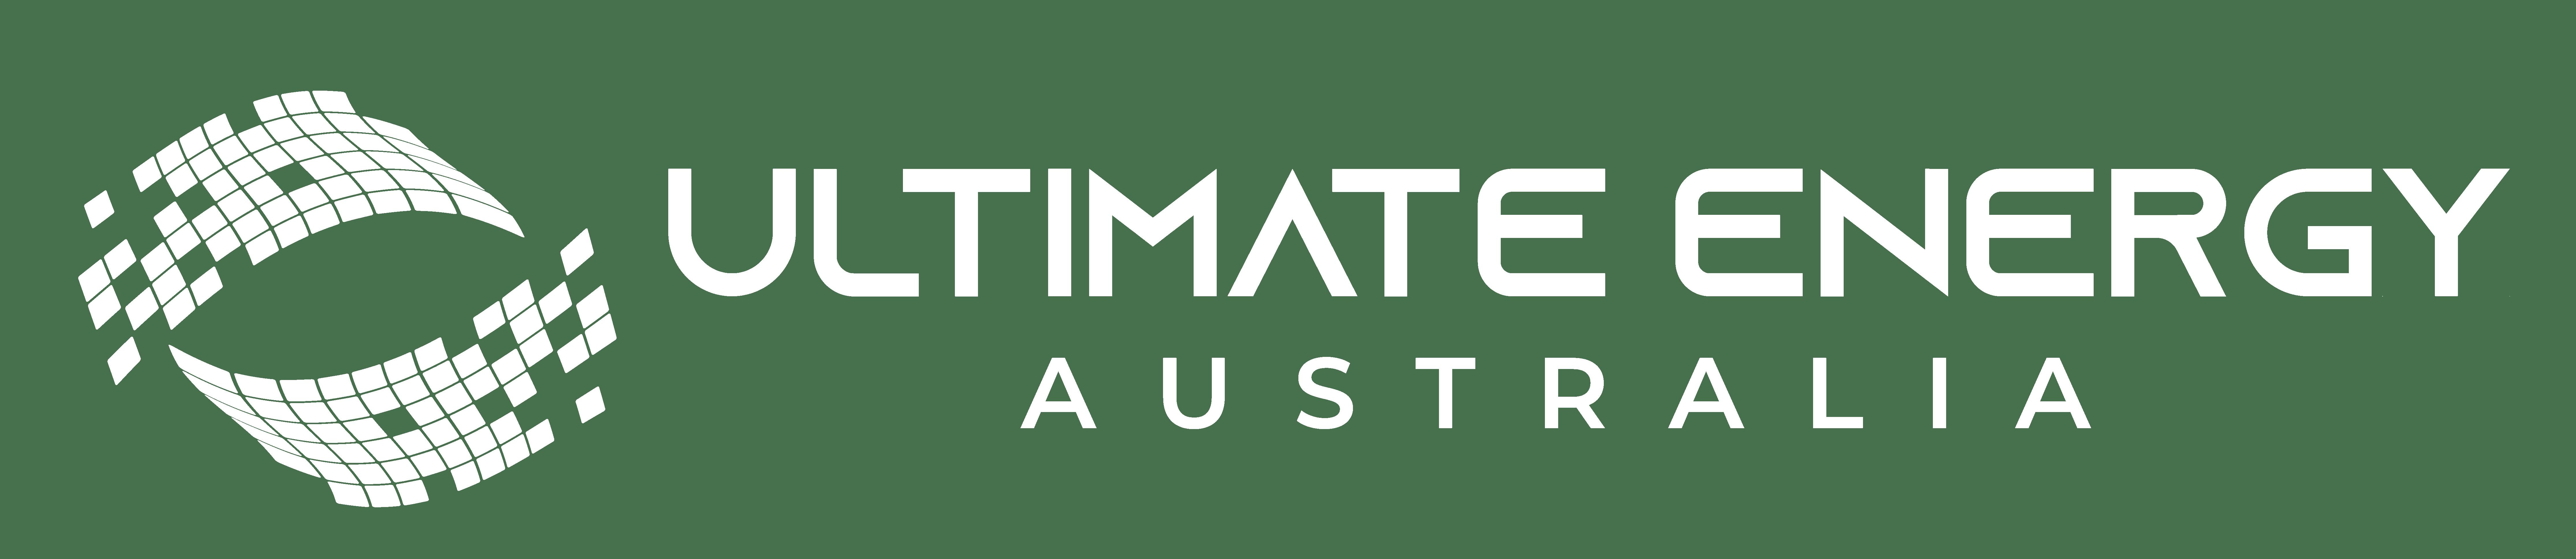 Ultimate Energy Australia